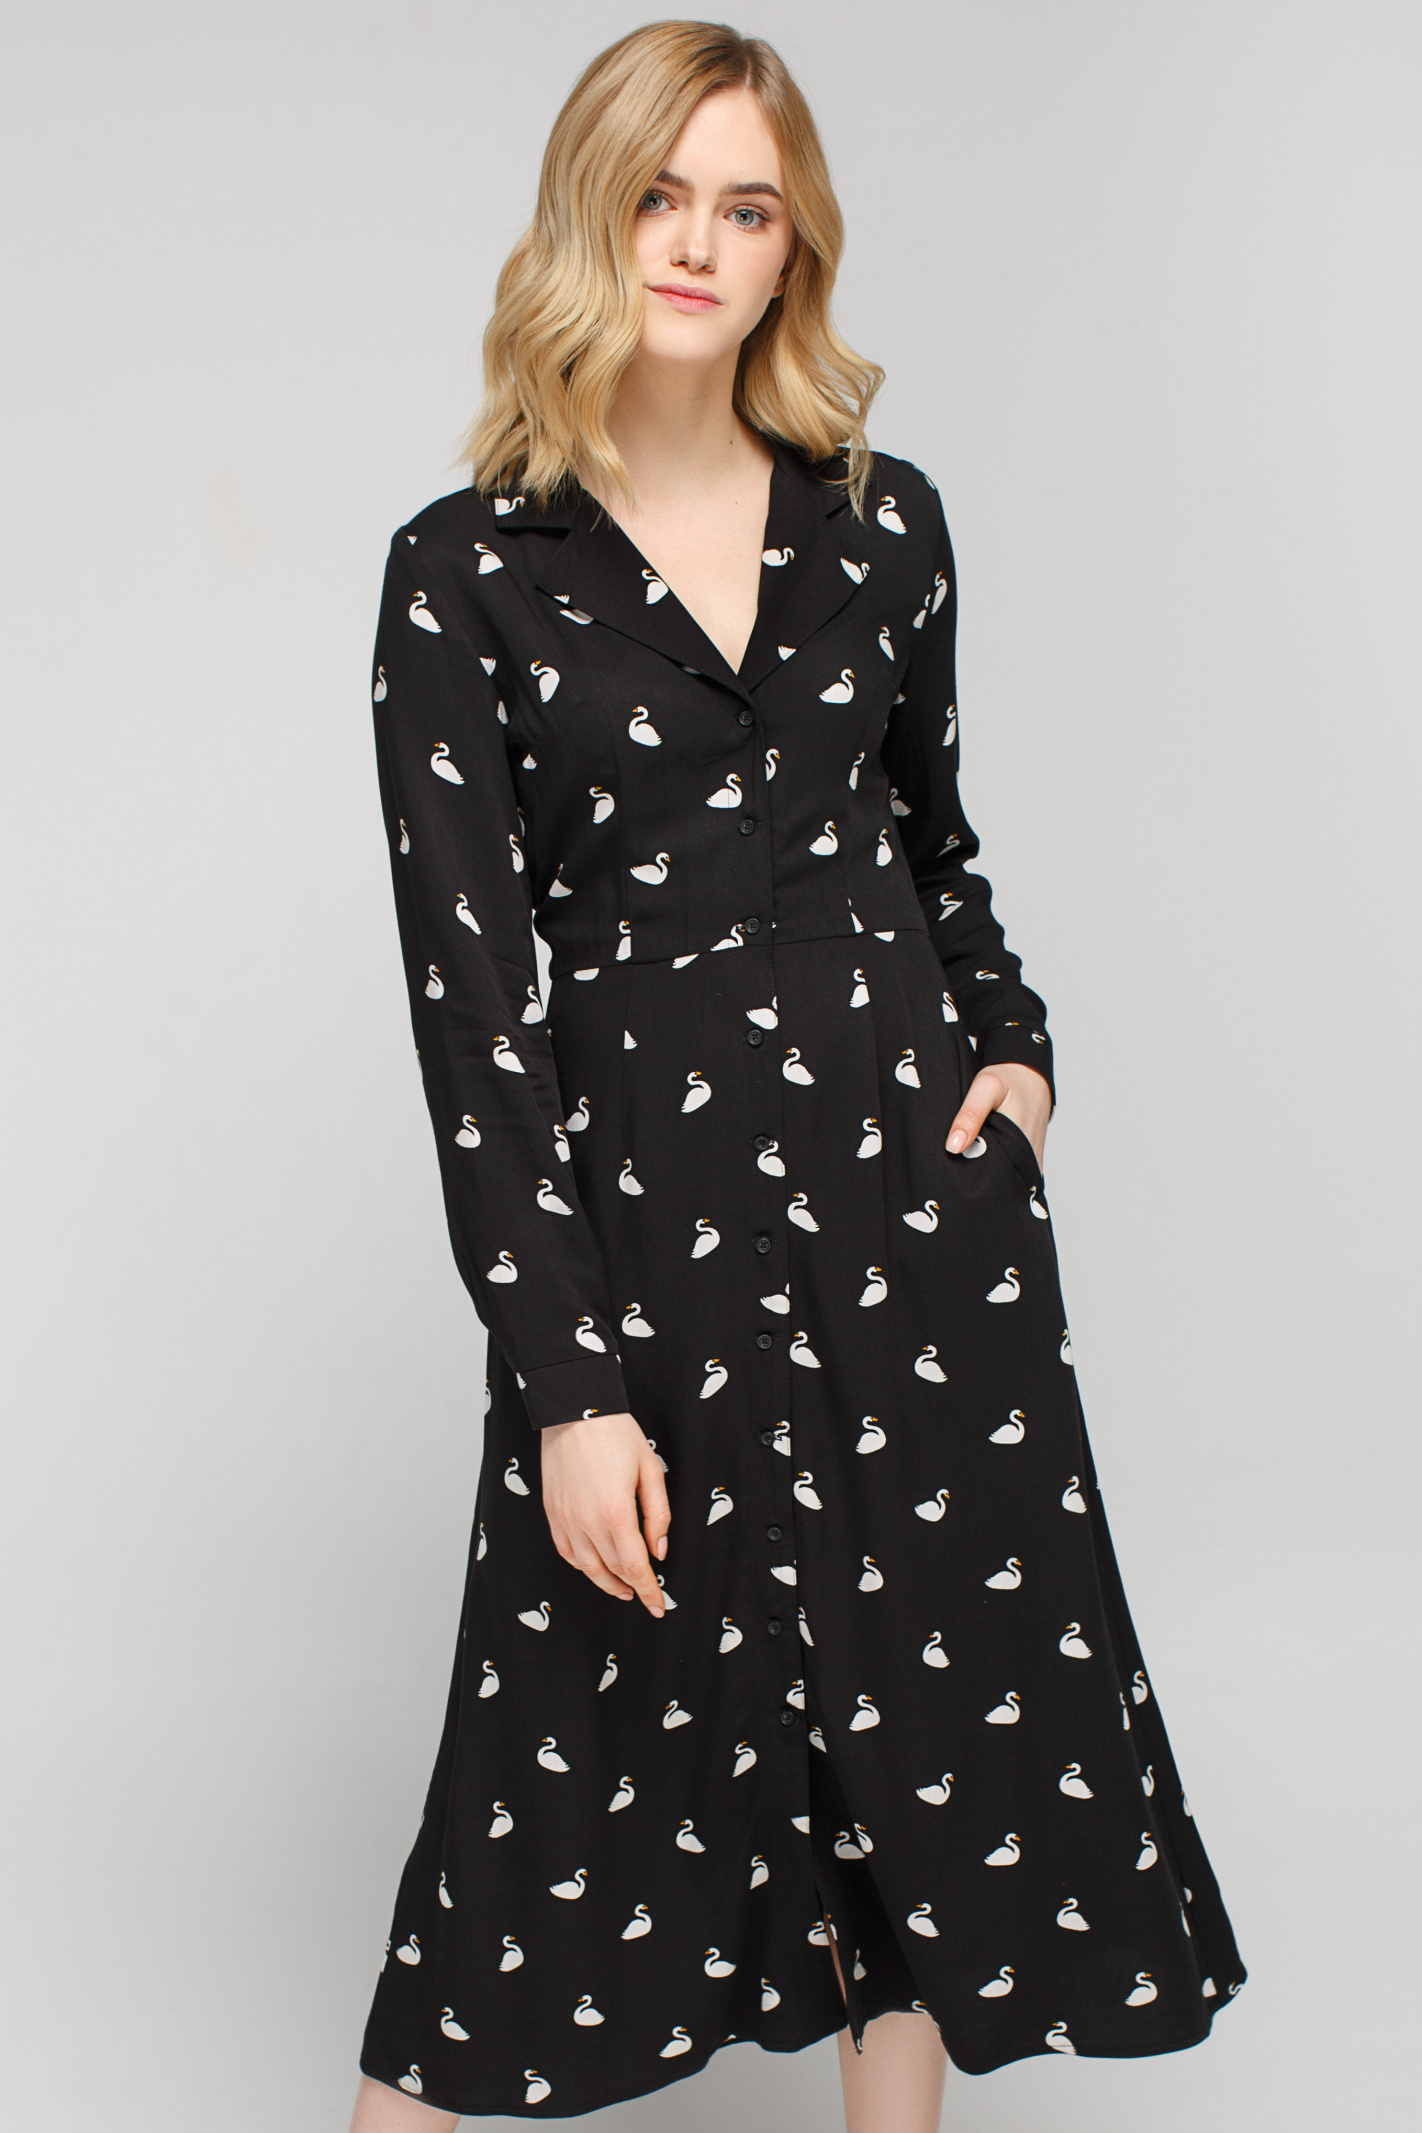 Платье женские MustHave модель 7490 приобрести, 2017